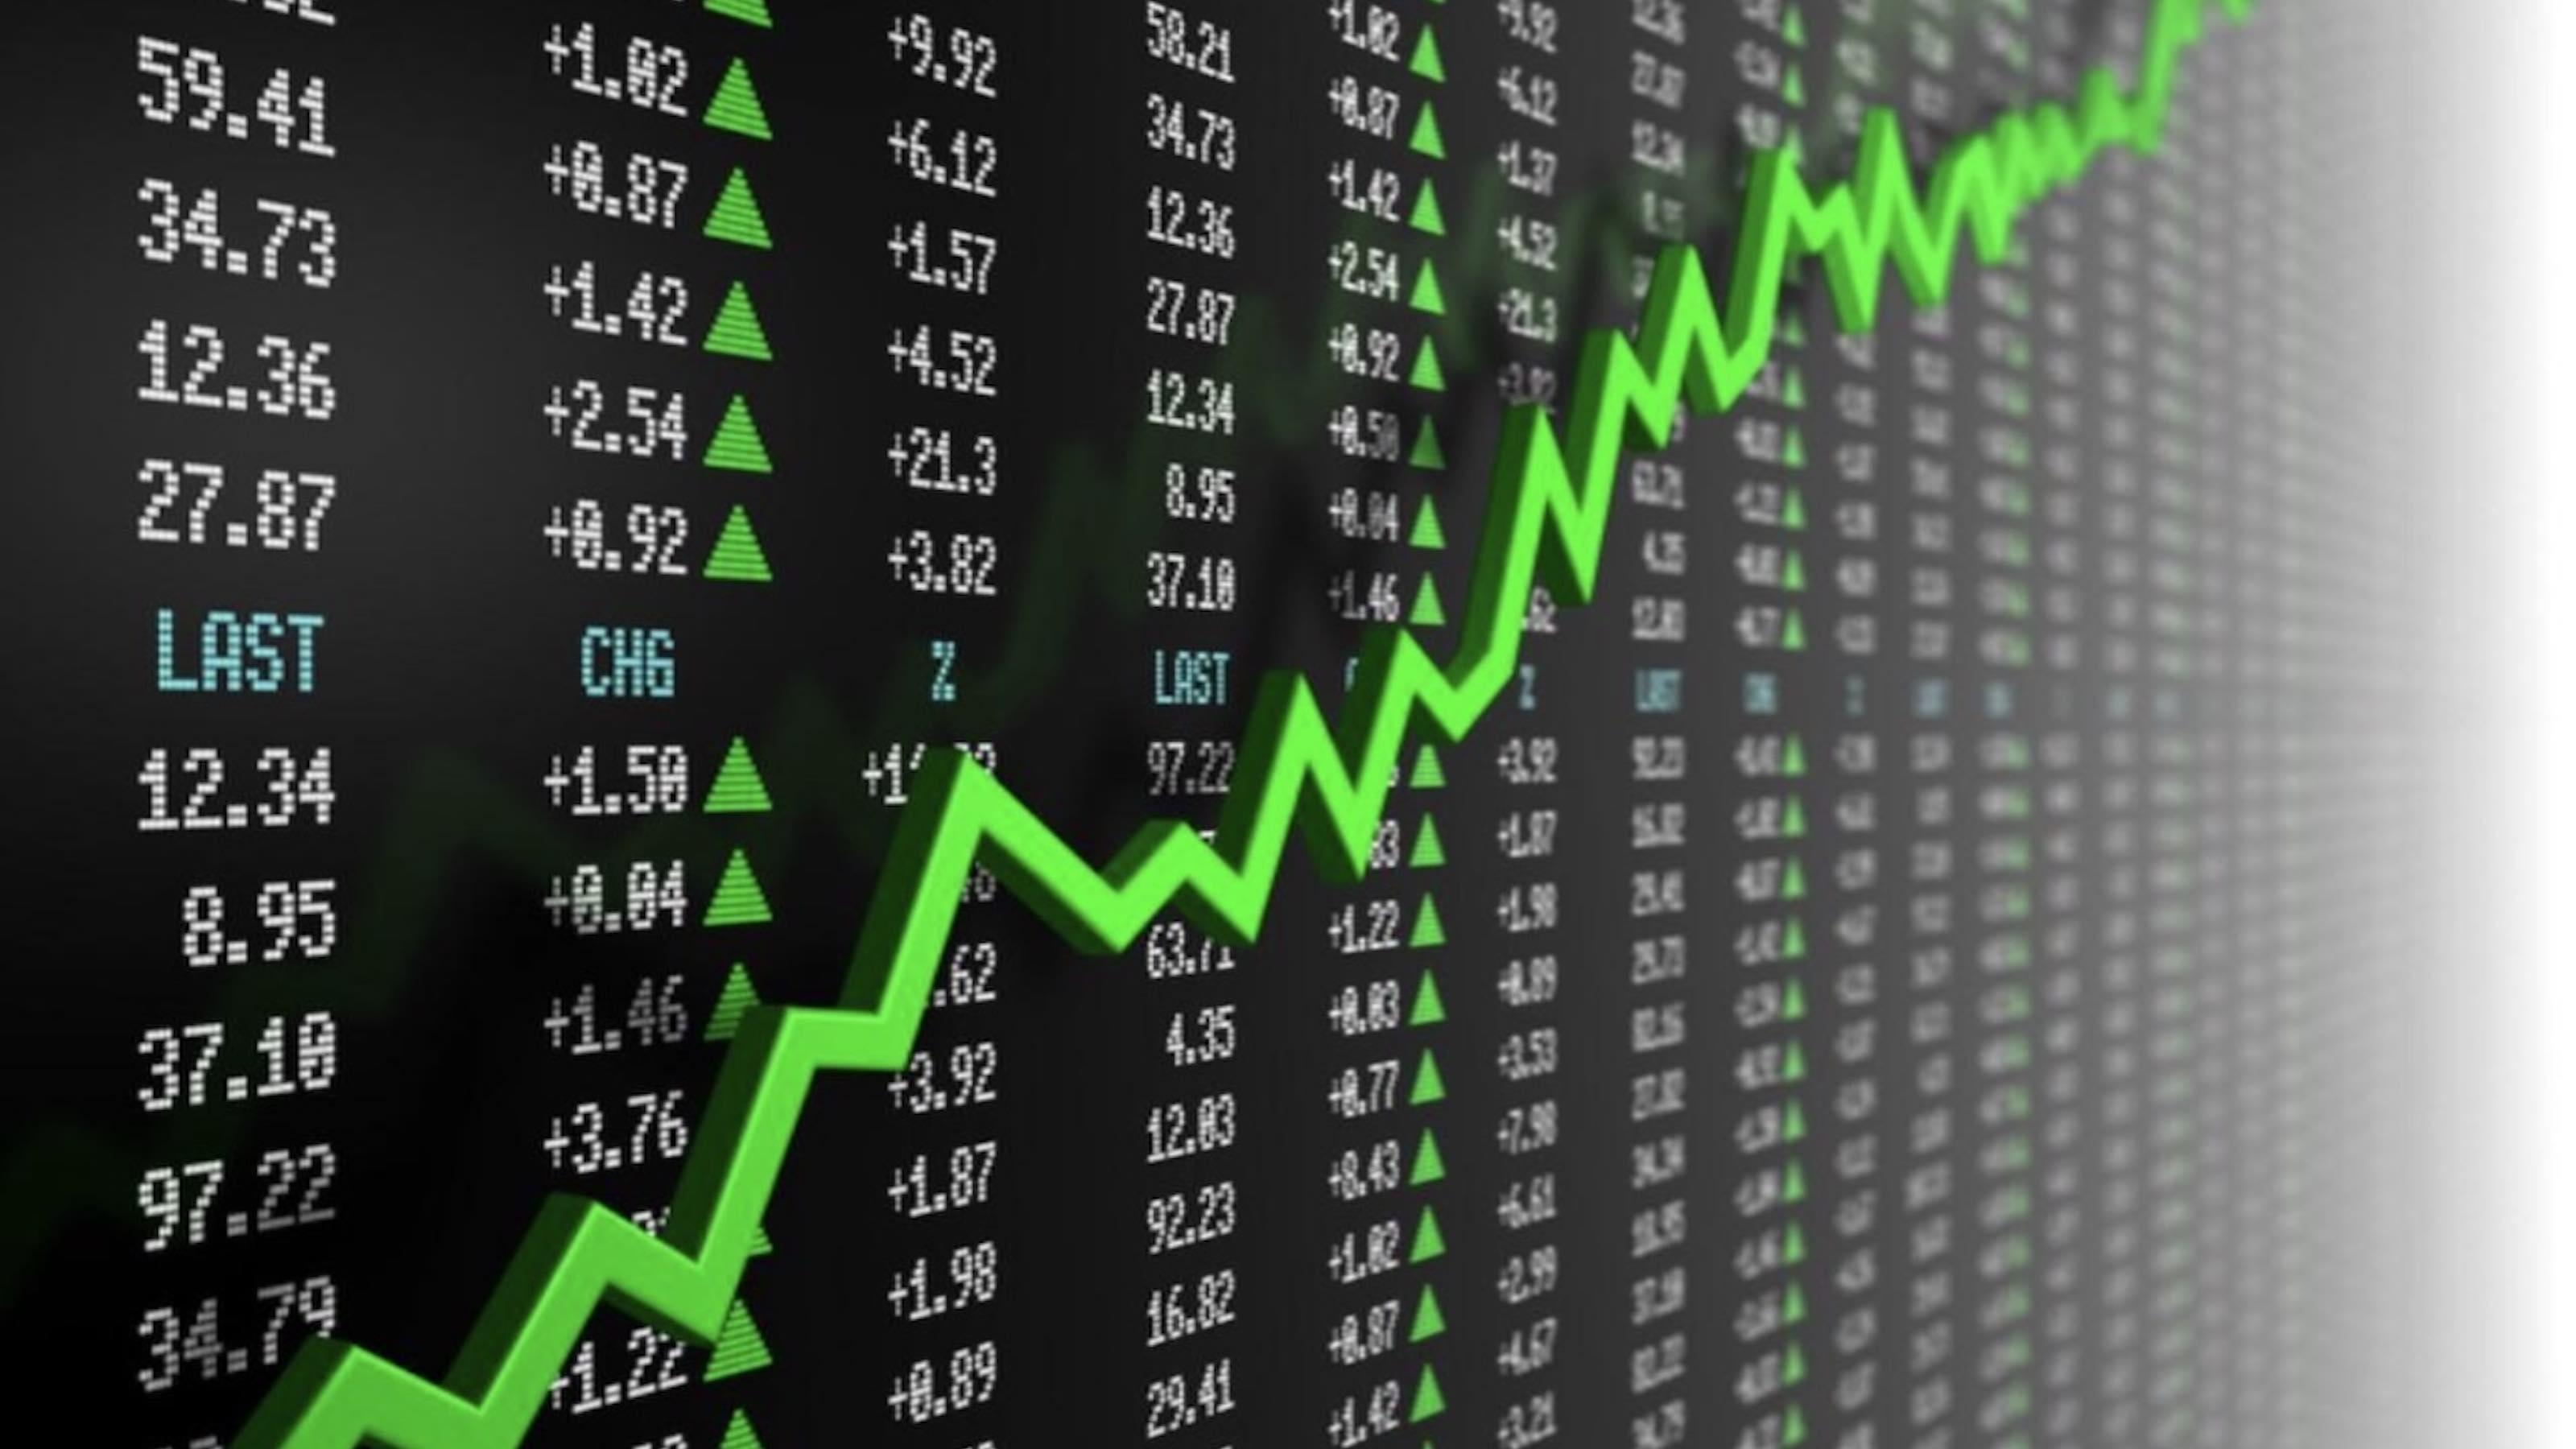 Ups Aktienkurs